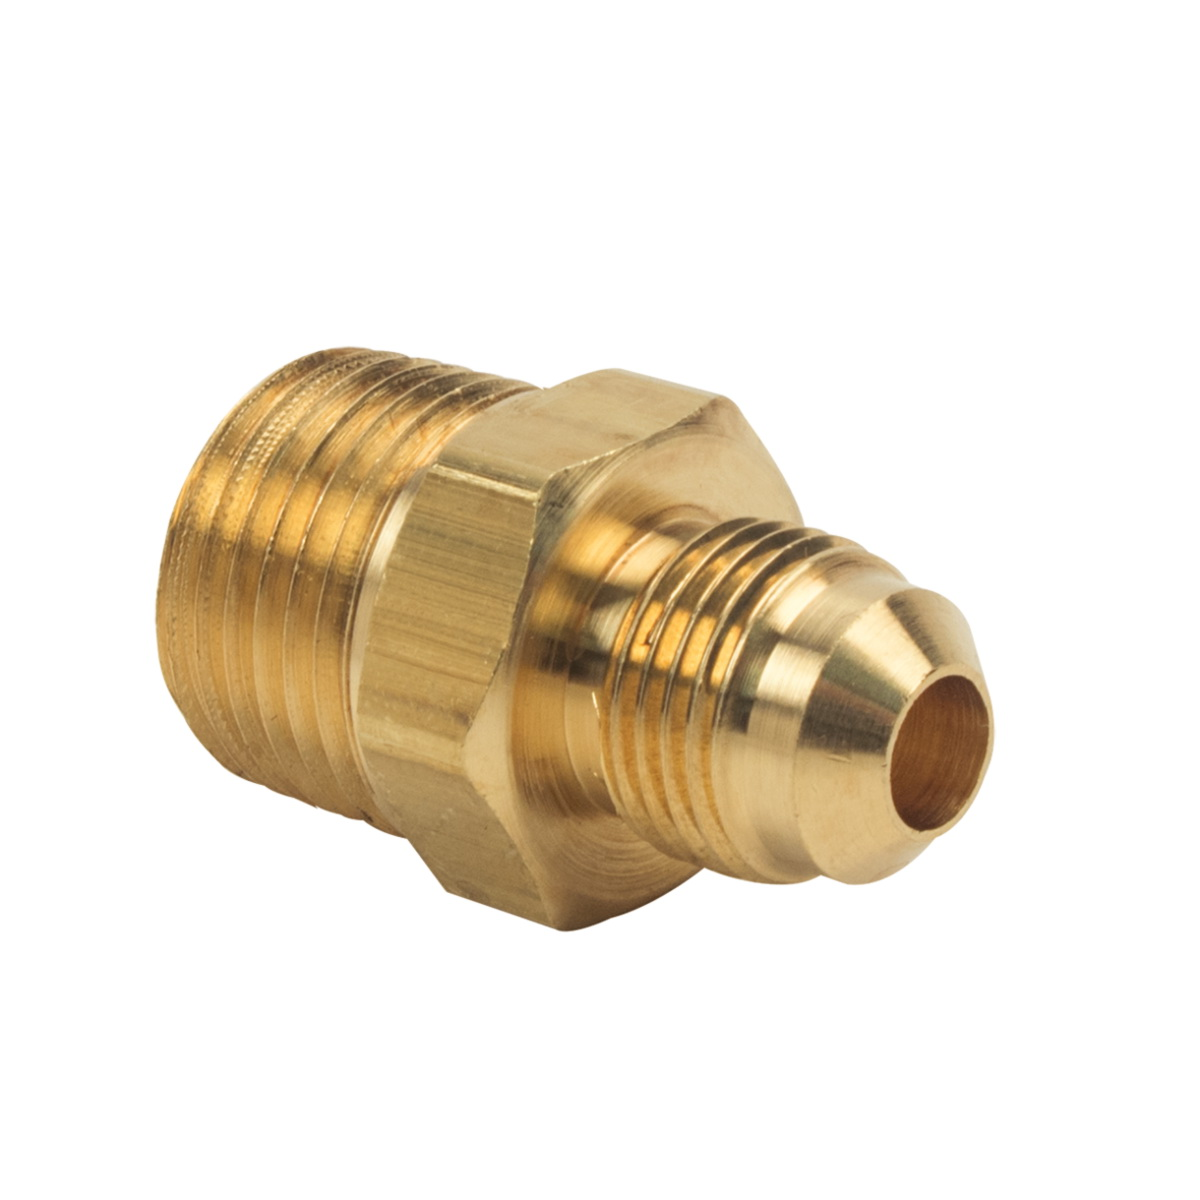 BrassCraft® 48-6-8 Rough Brass Adapter, 3/8 in x 1/2 in, Flare x MIP